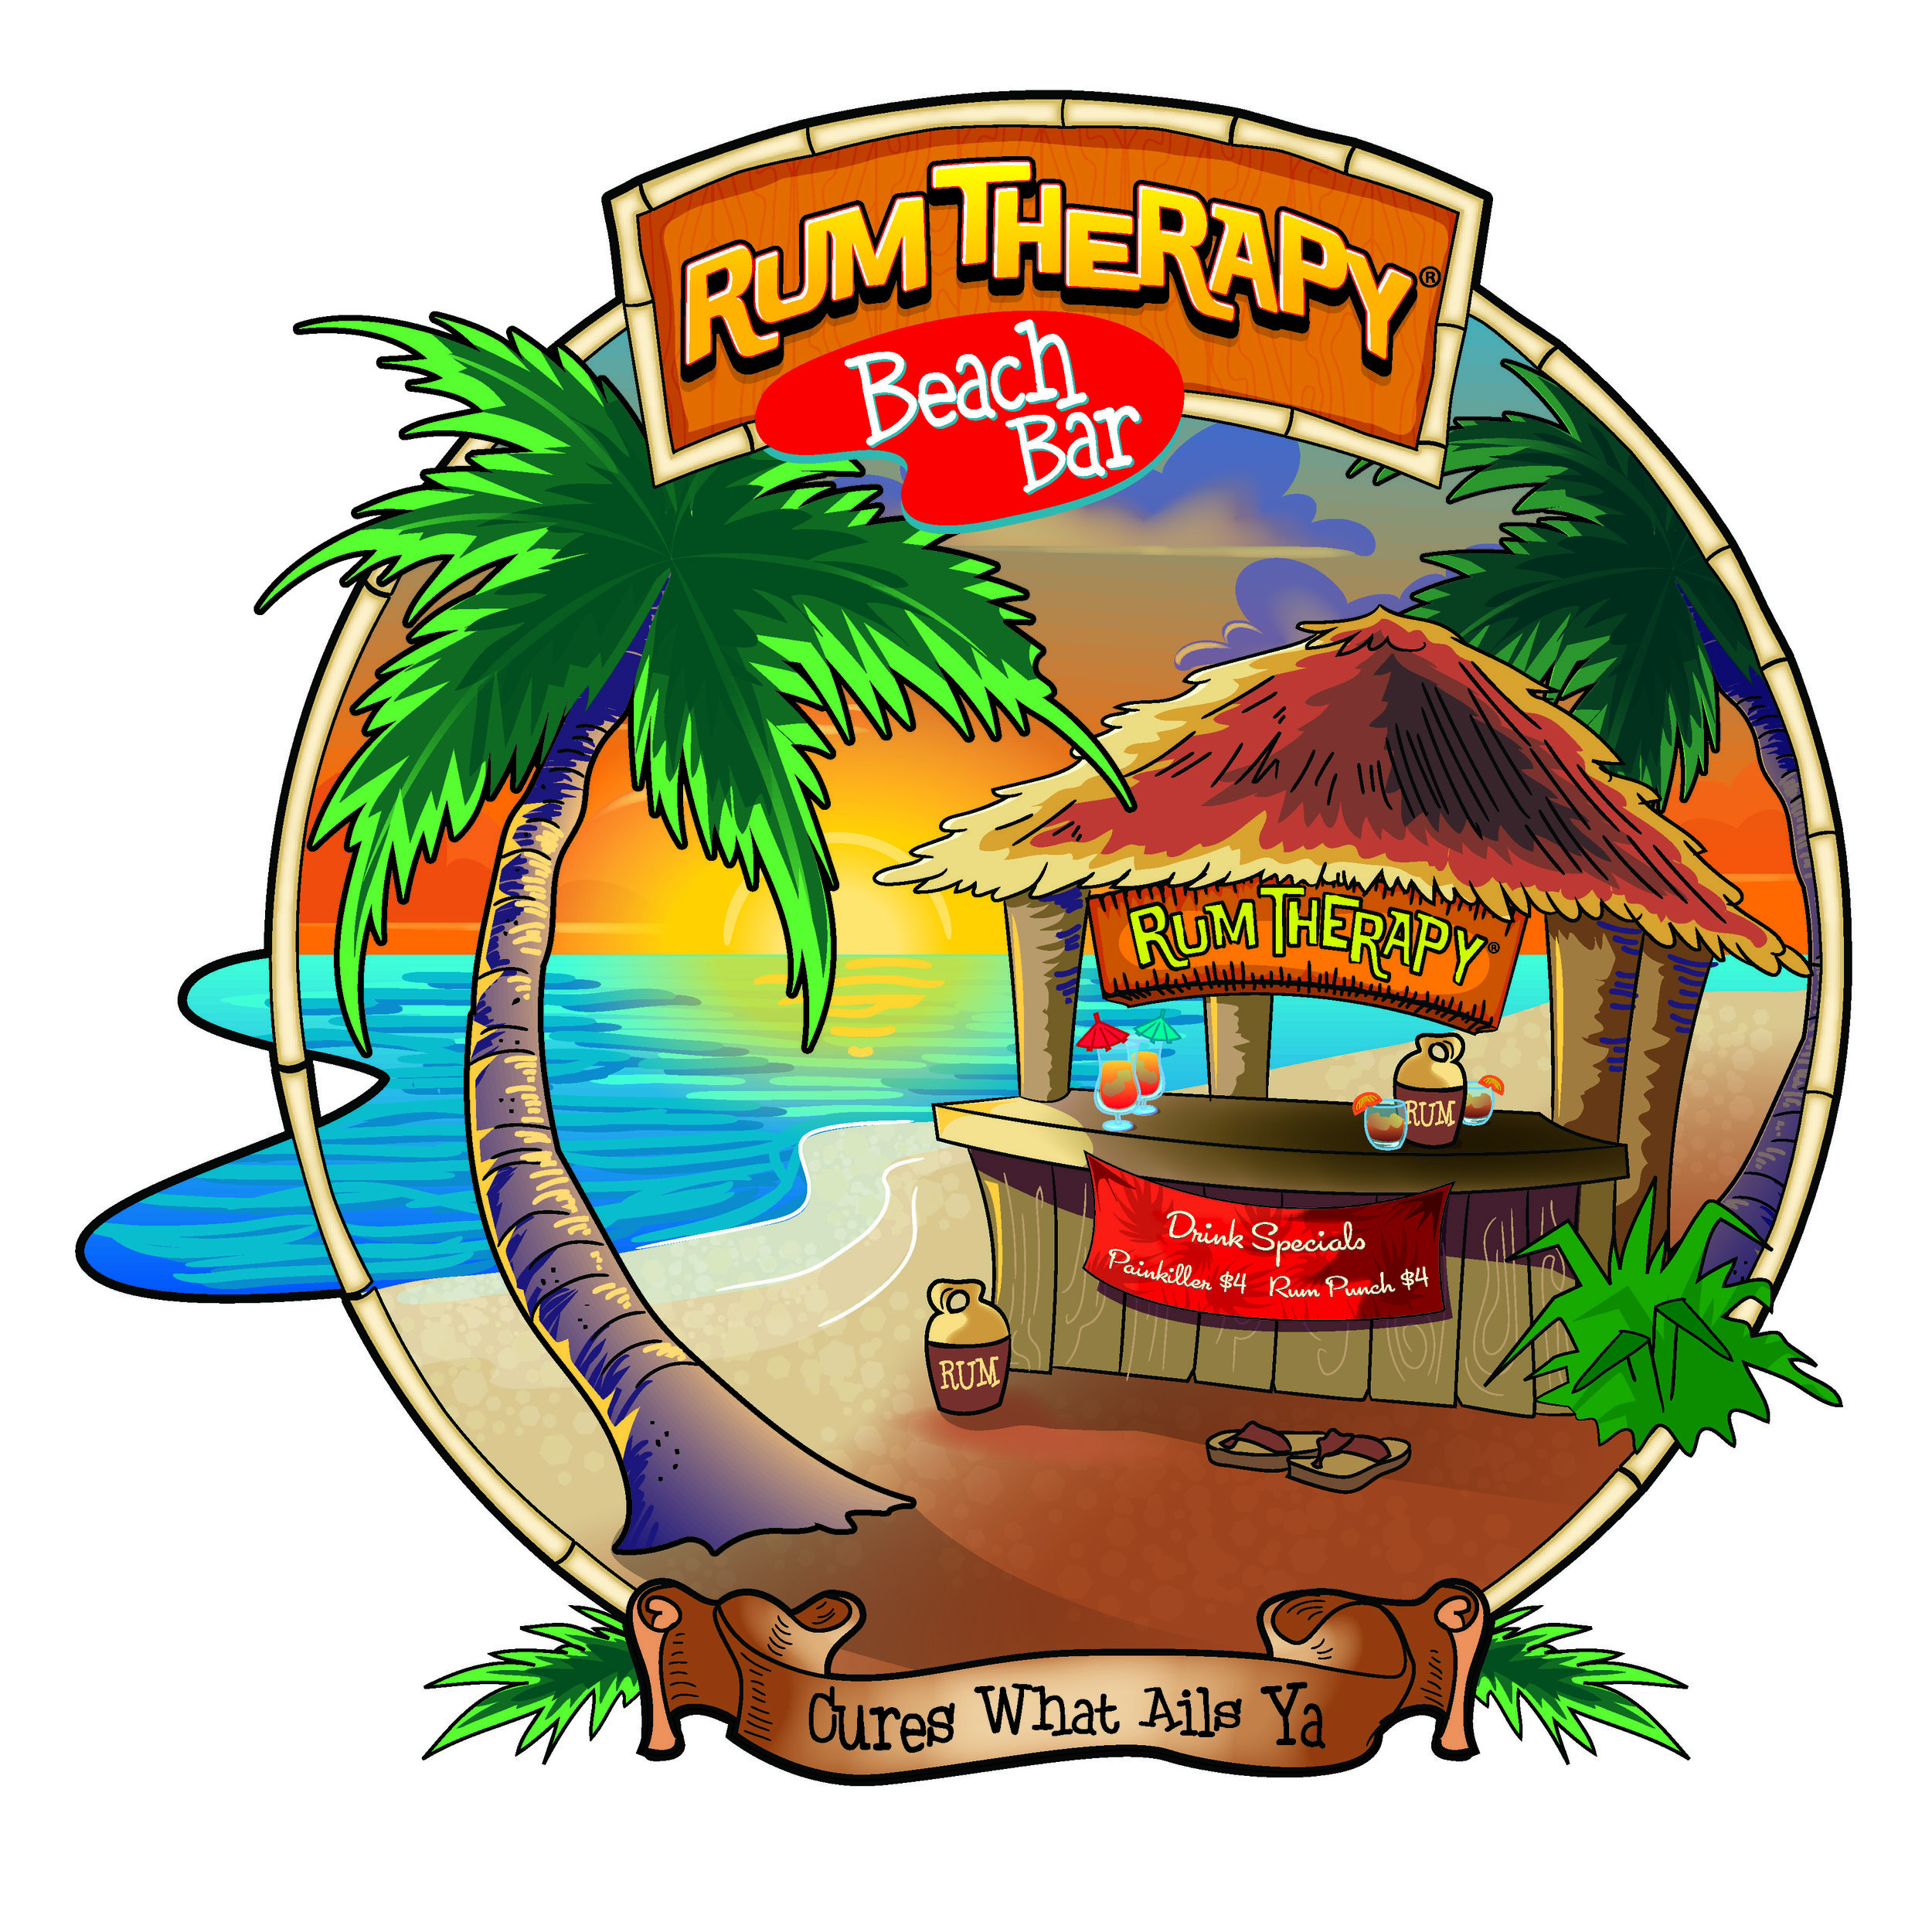 RumTherapy_BeachBar_FT_T-ShirtFiles_Page_2.jpg